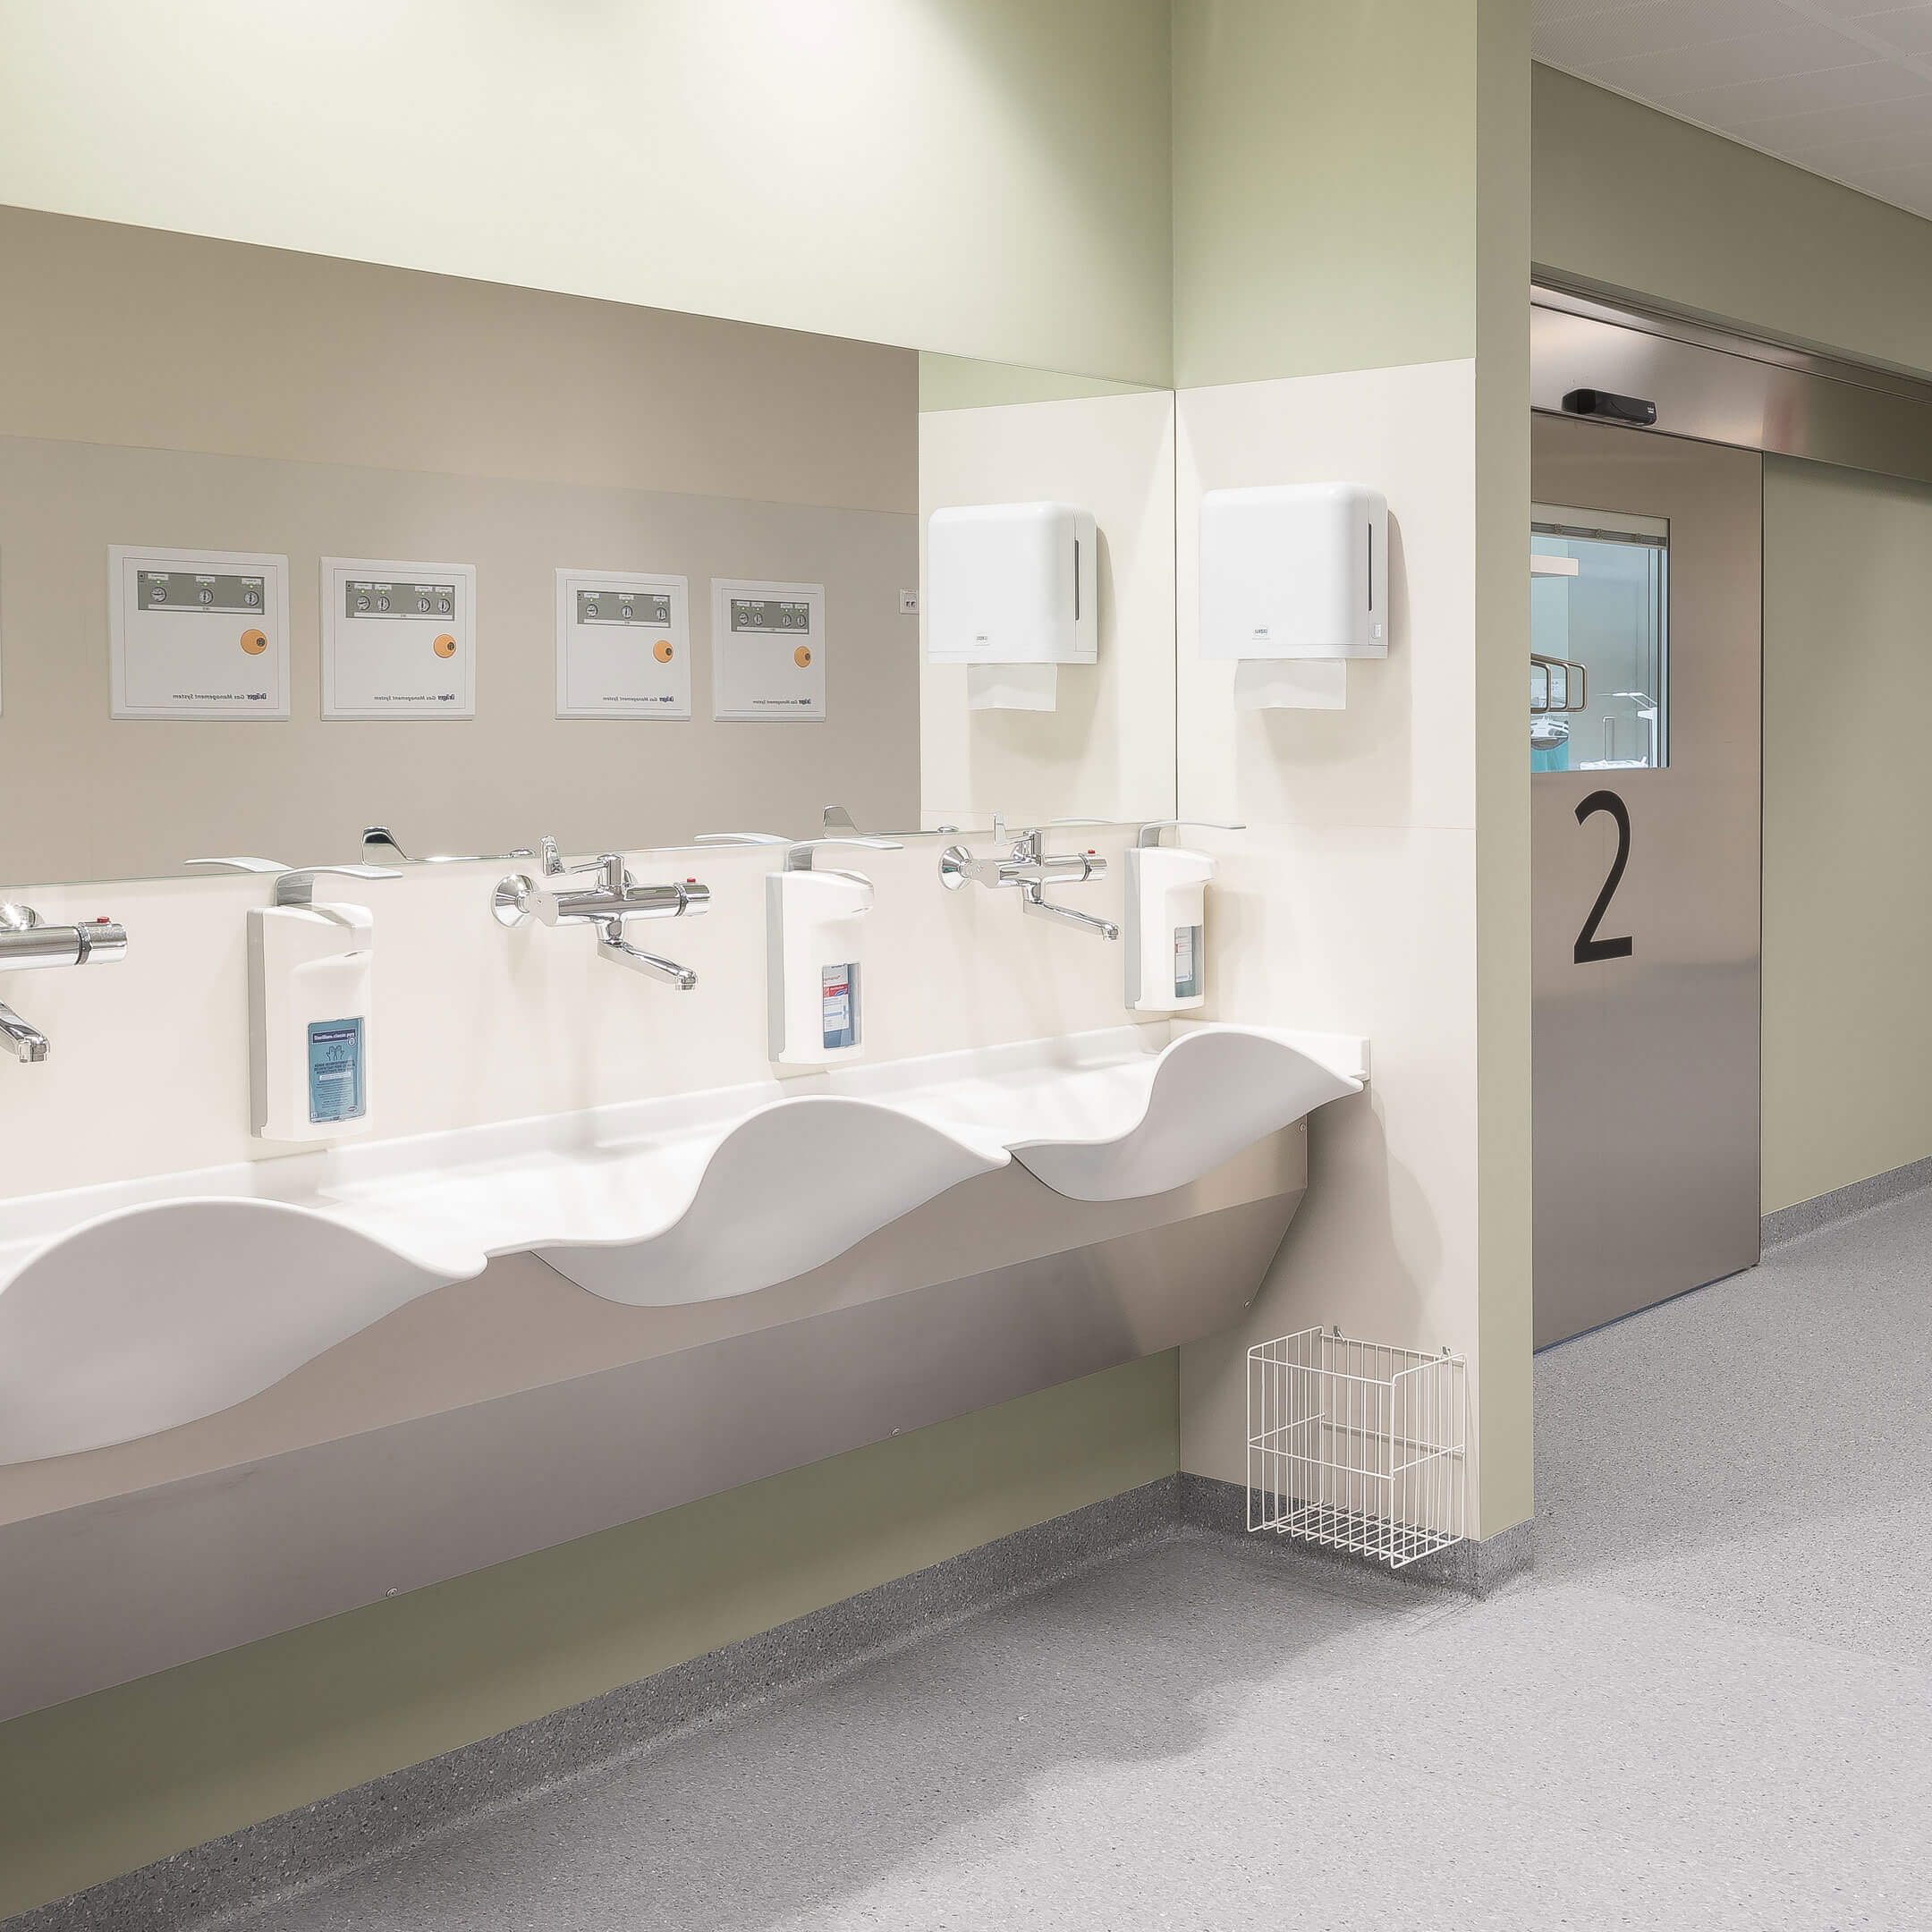 Klinika Diakonissen, novostavba operačního sálu v Linci, Rakousko